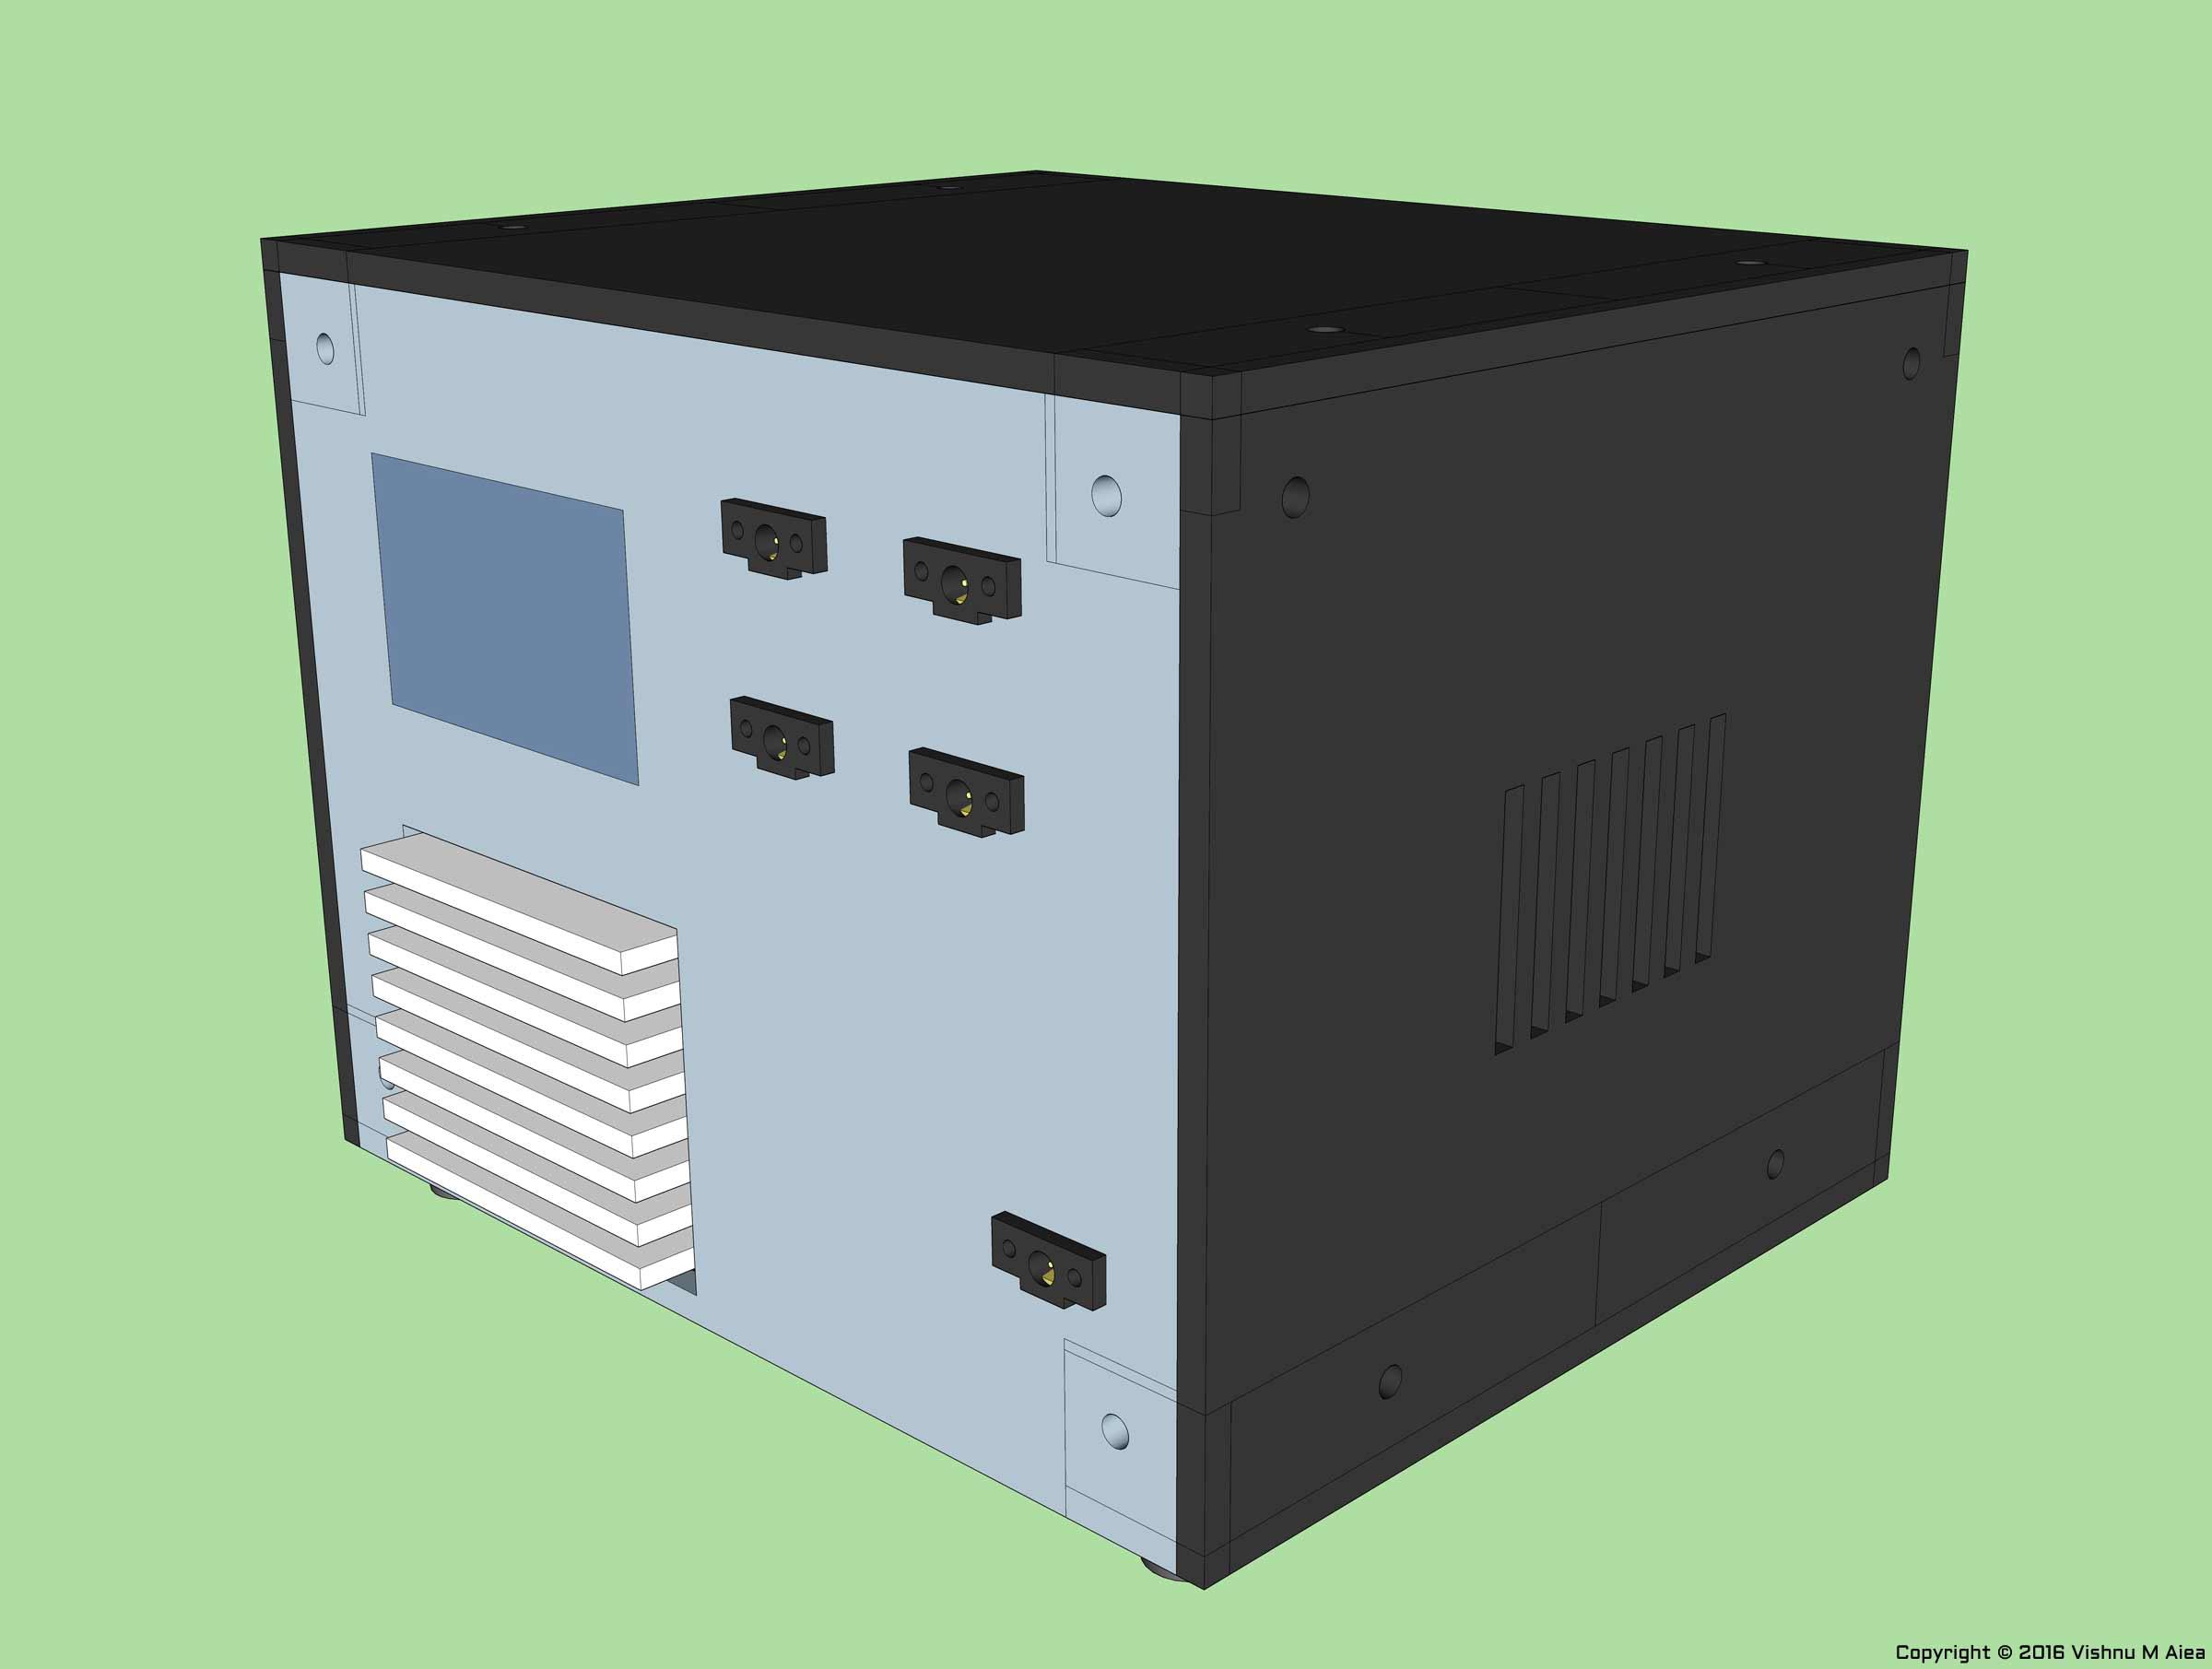 LM317 Benchtop Power Supply - Vishnu M Aiea